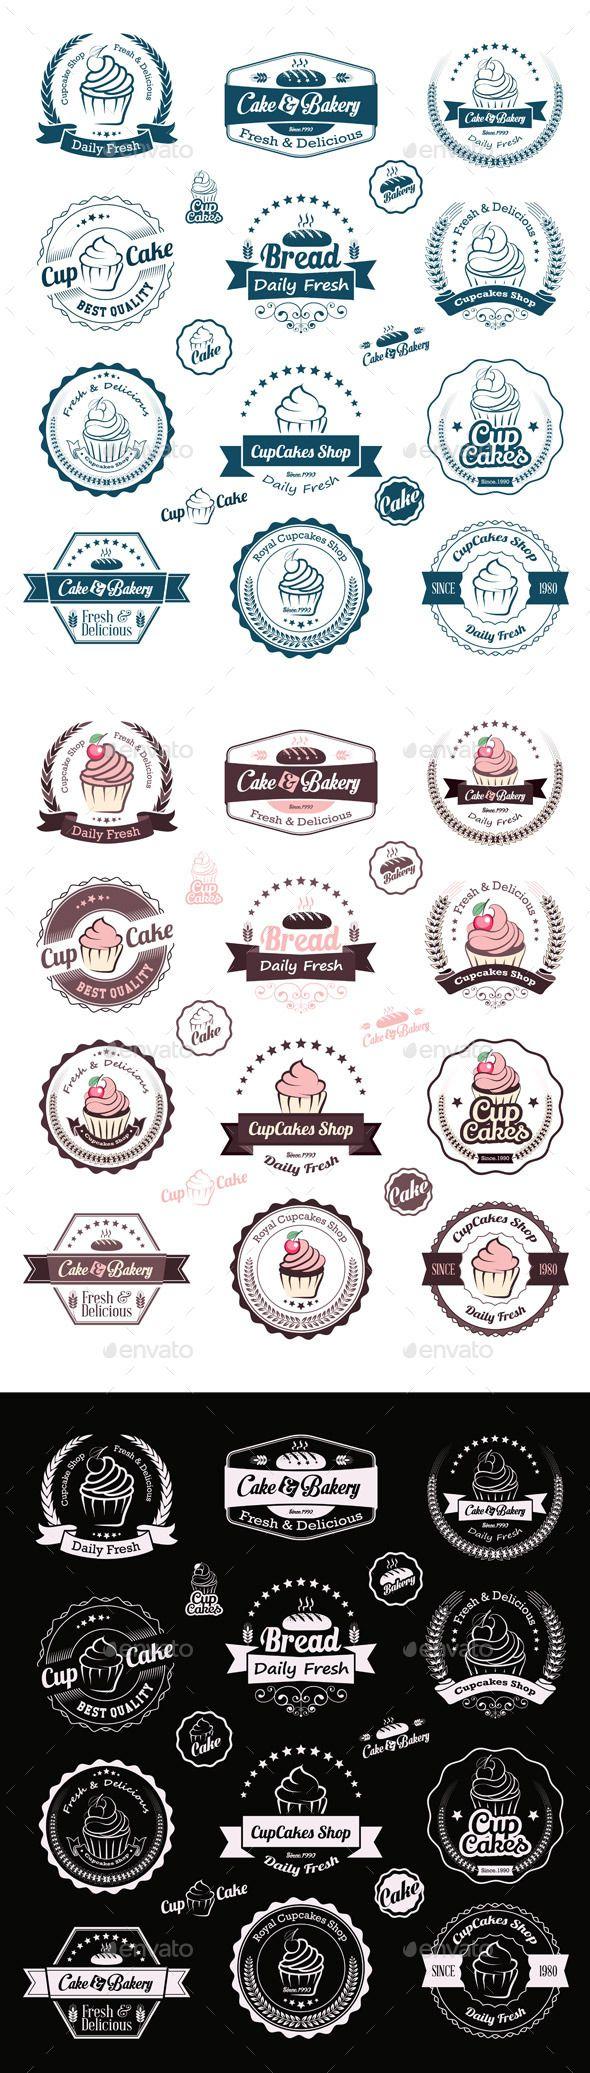 Cupcakes Vintage Labels Vector Template #design Download: http://graphicriver.net/item/cupcakes-vintage-labels/9406205?ref=ksioks